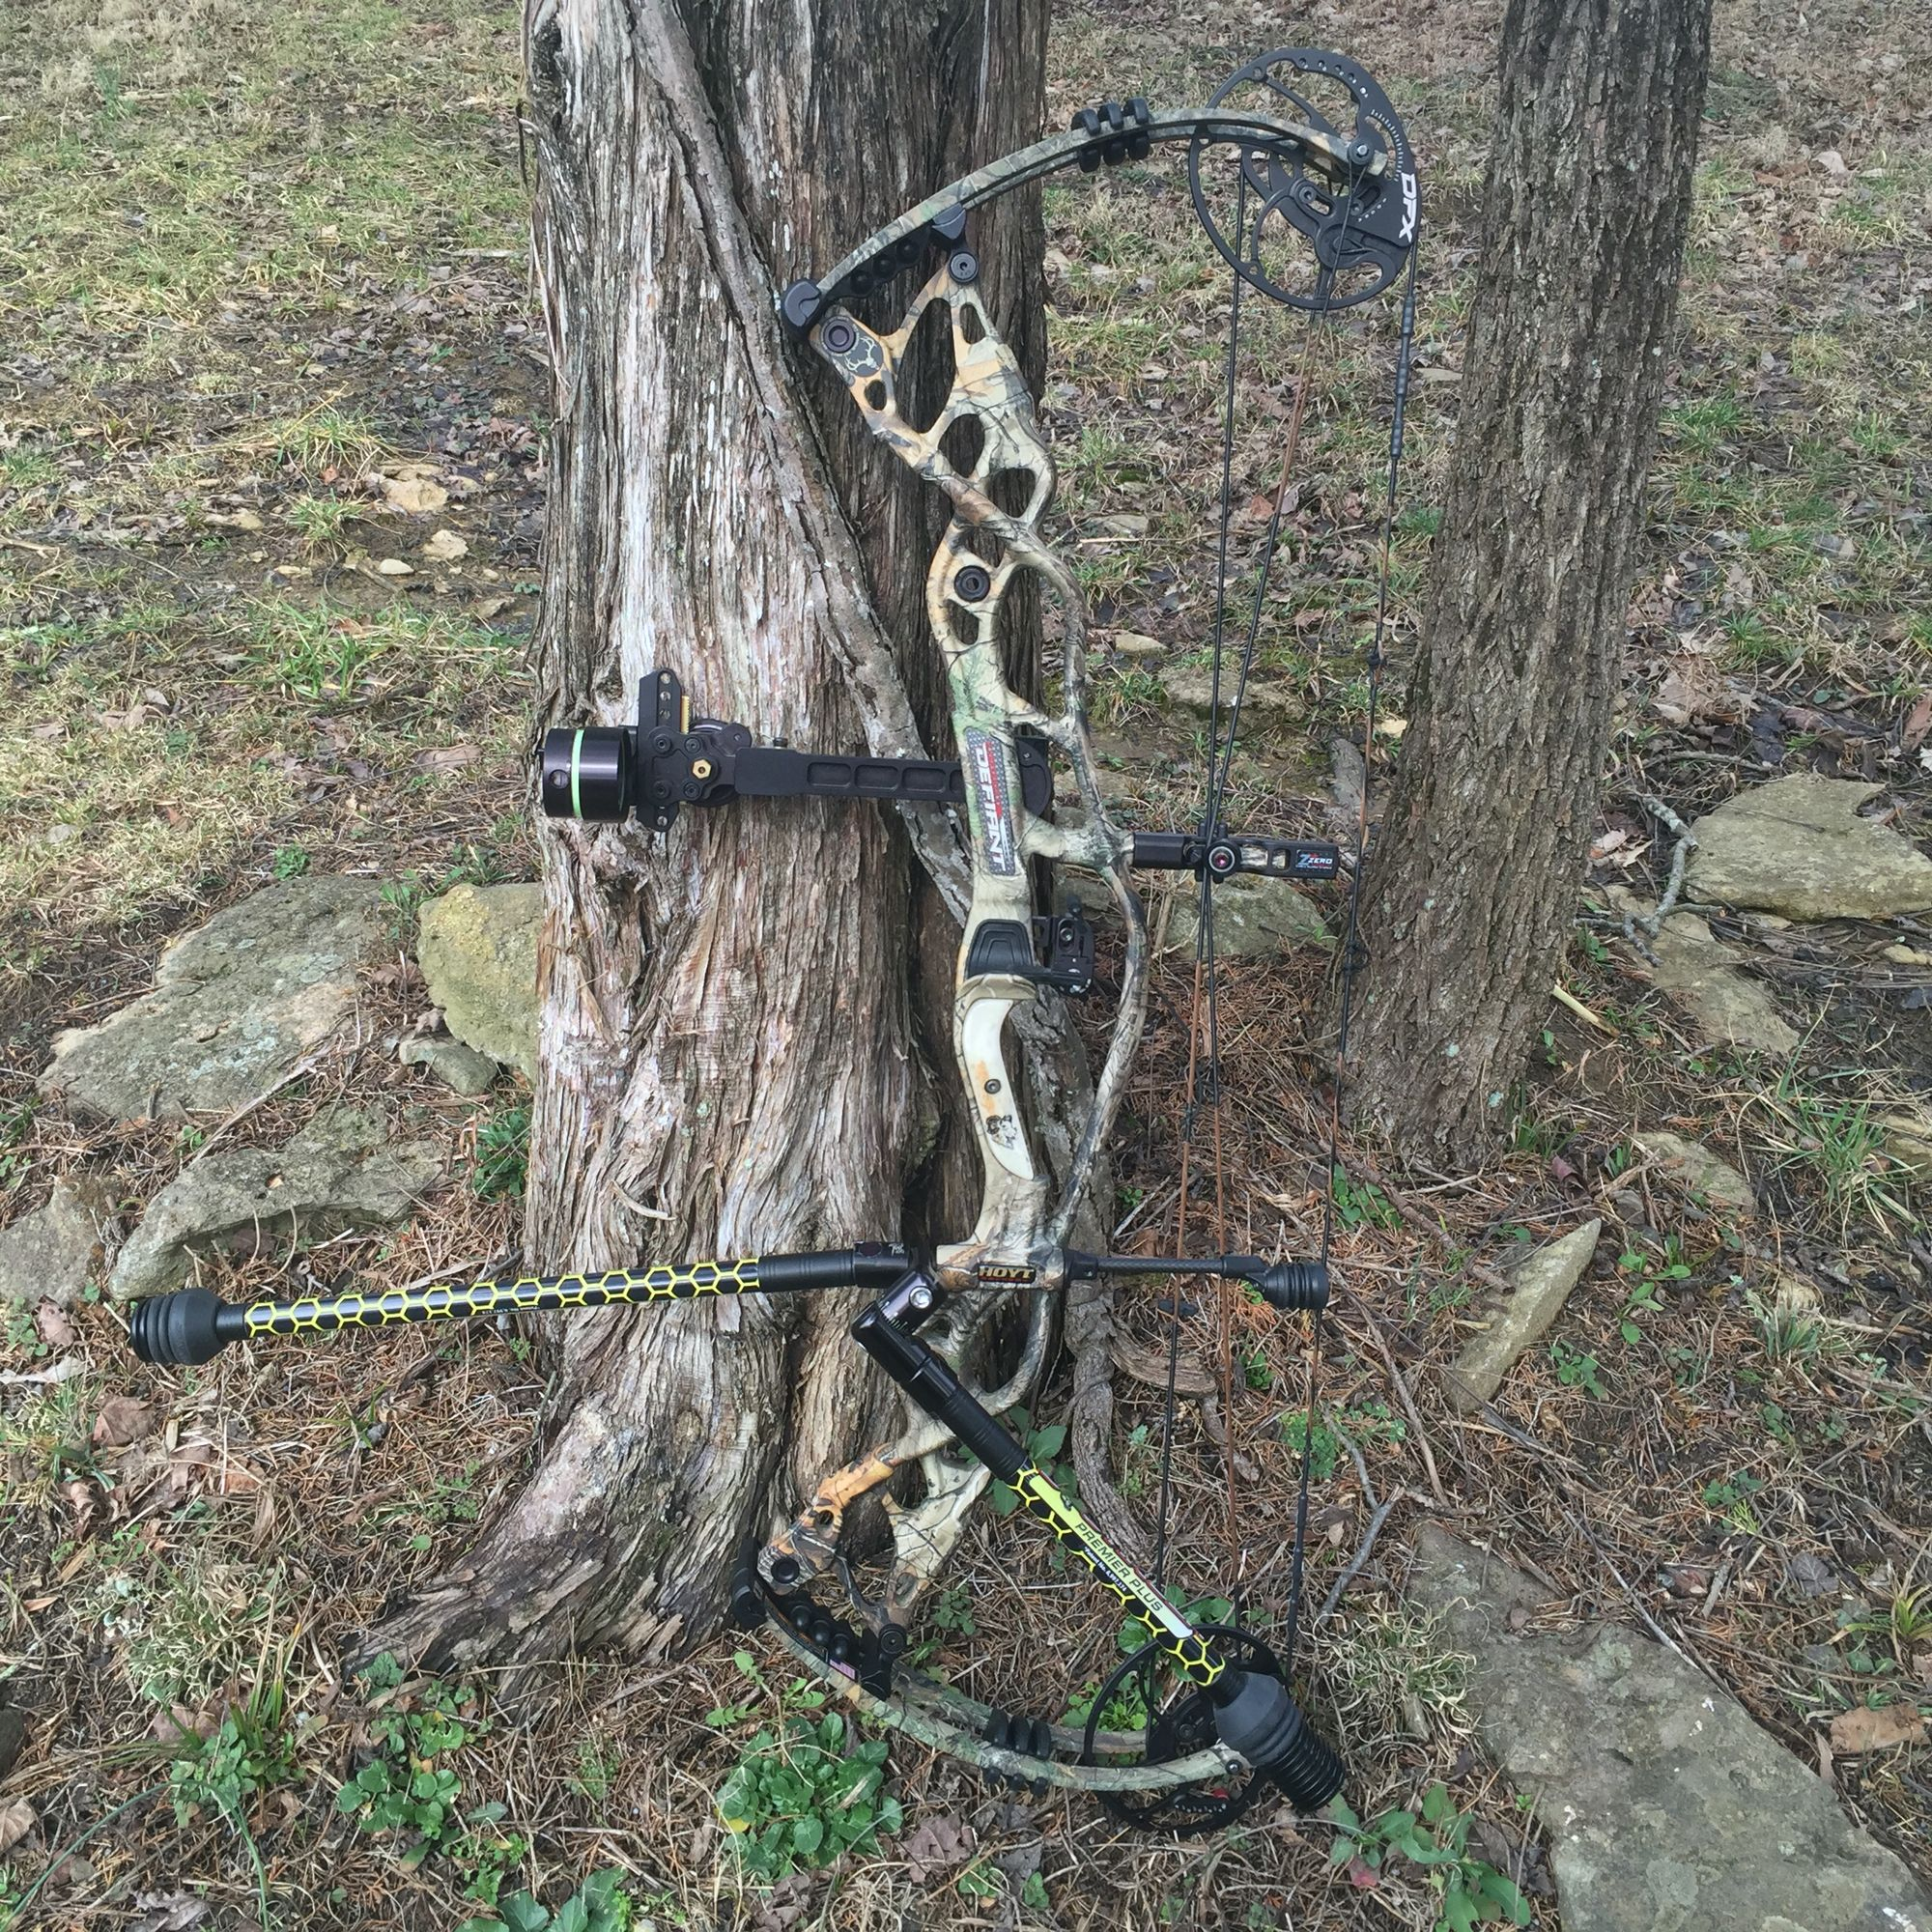 Carbon Defiant 34 Hoyt Archery Archery Bows Archery Tips Hoyt